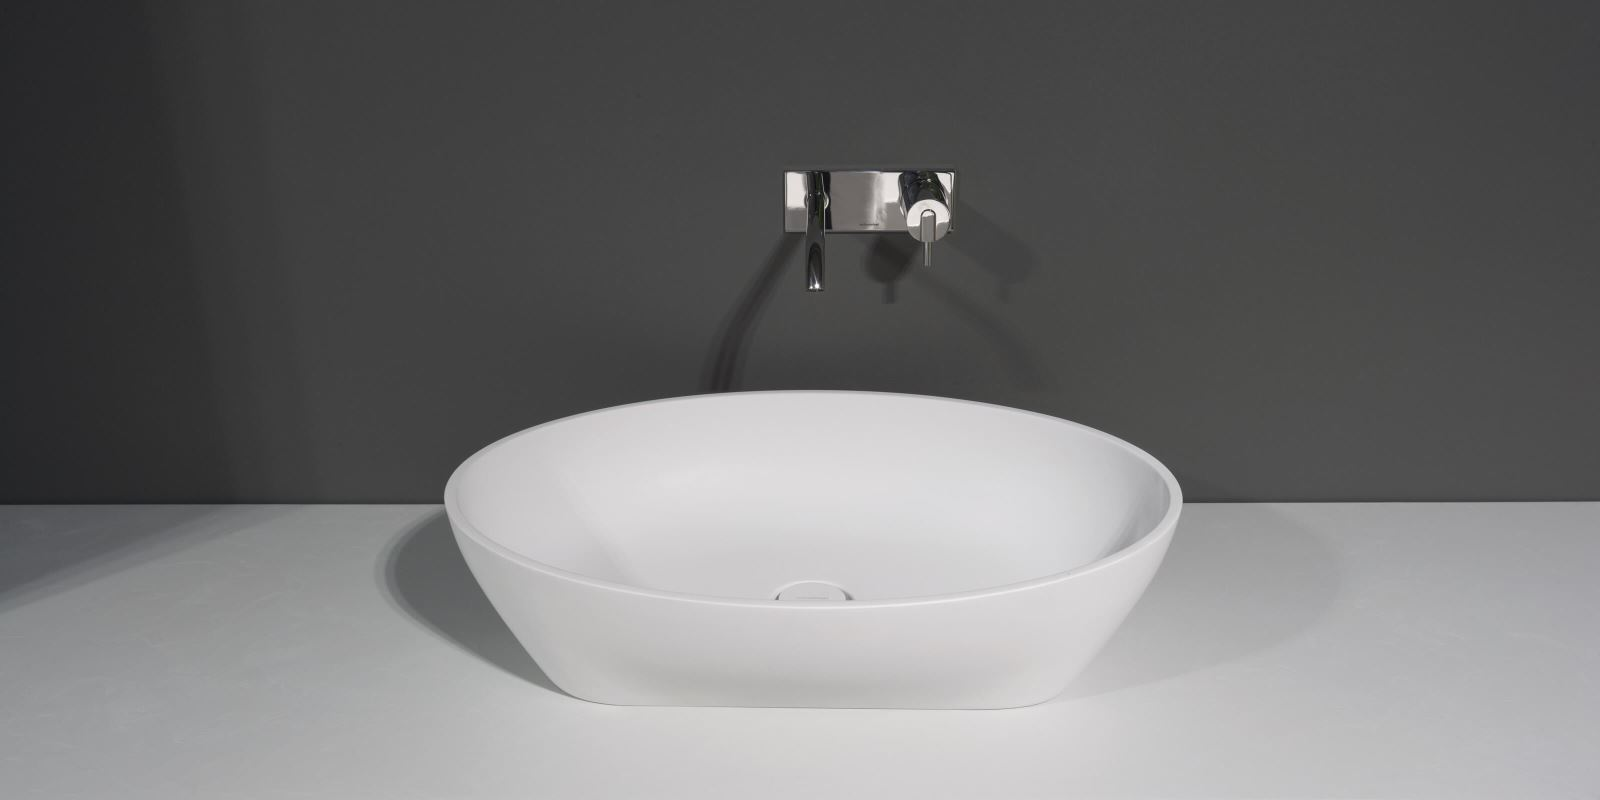 Antonio Lupi lavabo